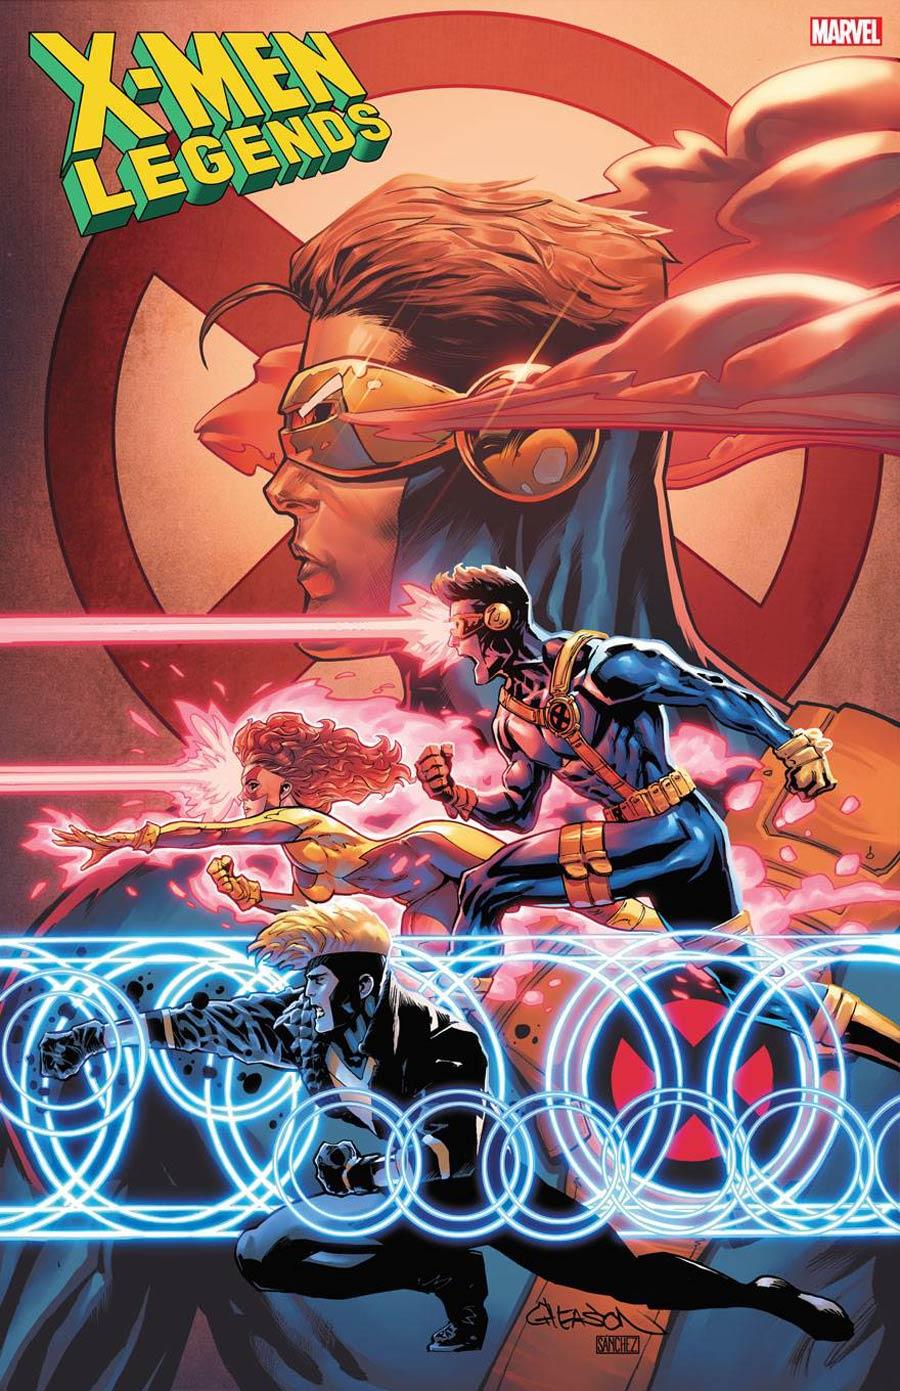 X-Men Legends #1 Cover D Variant Patrick Gleason Stormbreakers Cover